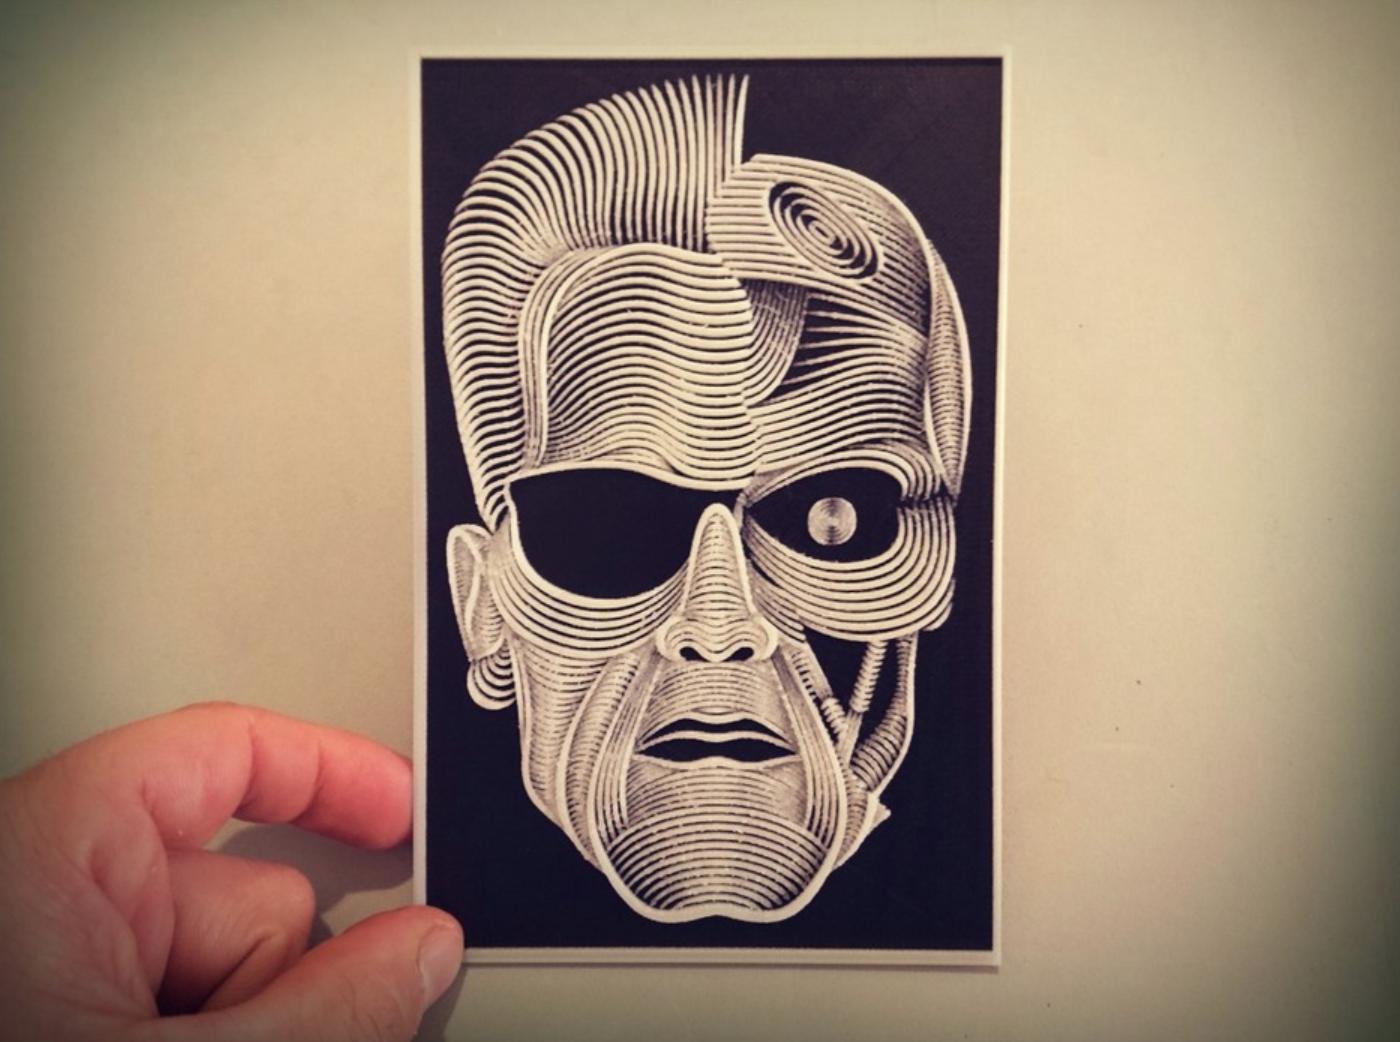 Capture d'écran 2017-12-27 à 10.14.53.png Download free STL file Terminator 3D • 3D printing template, 3dlito